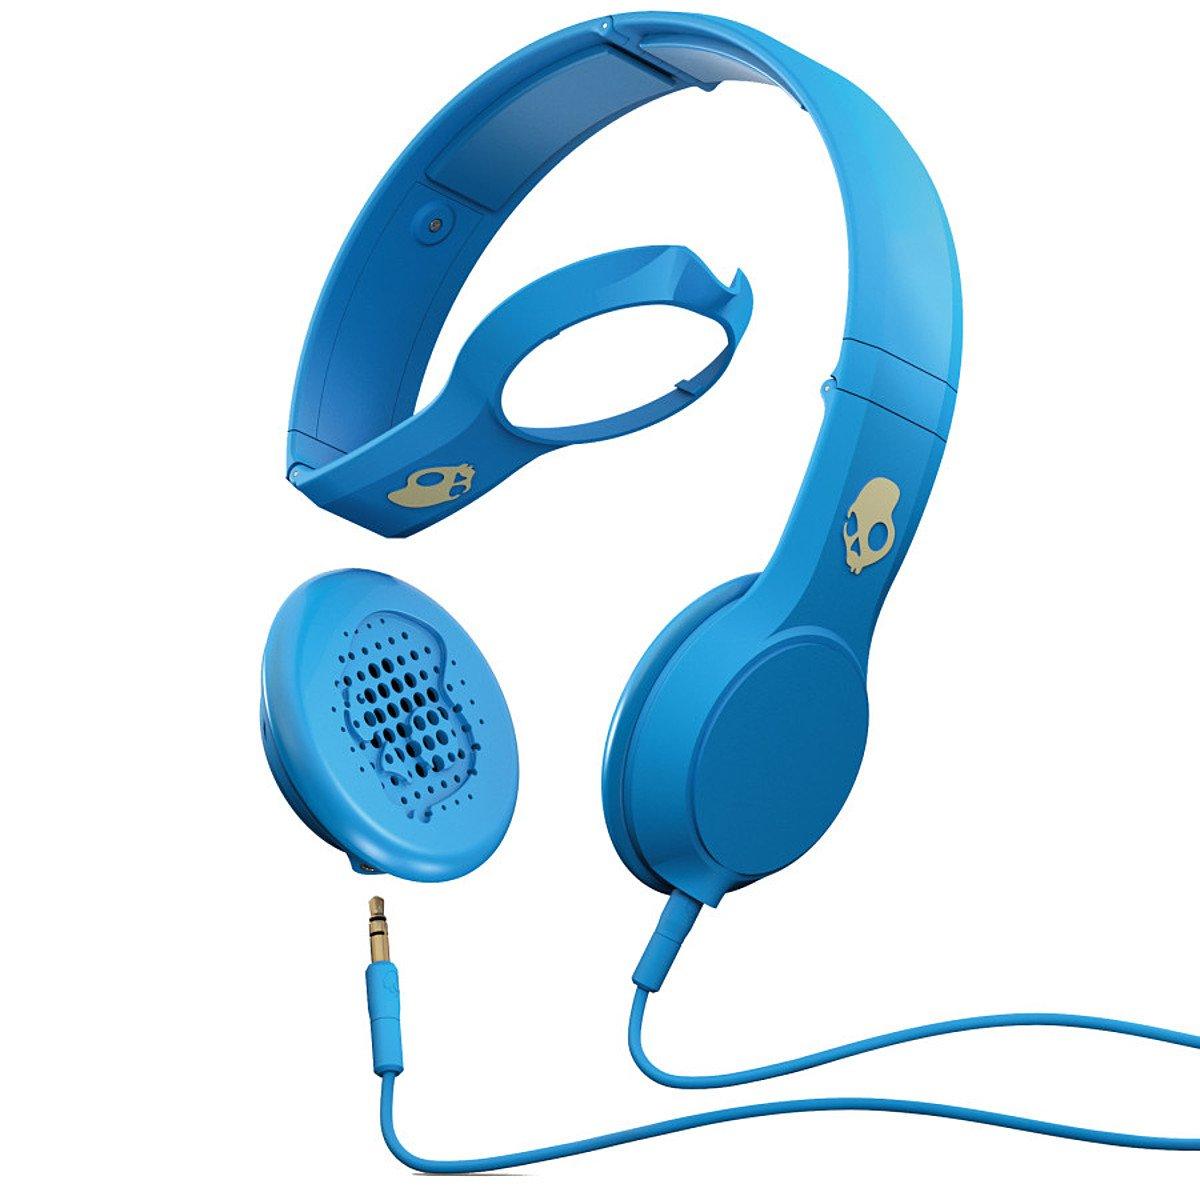 Amazon.com: Skullcandy Cassette Headphones w/ Mic1 Athletic Blue ...